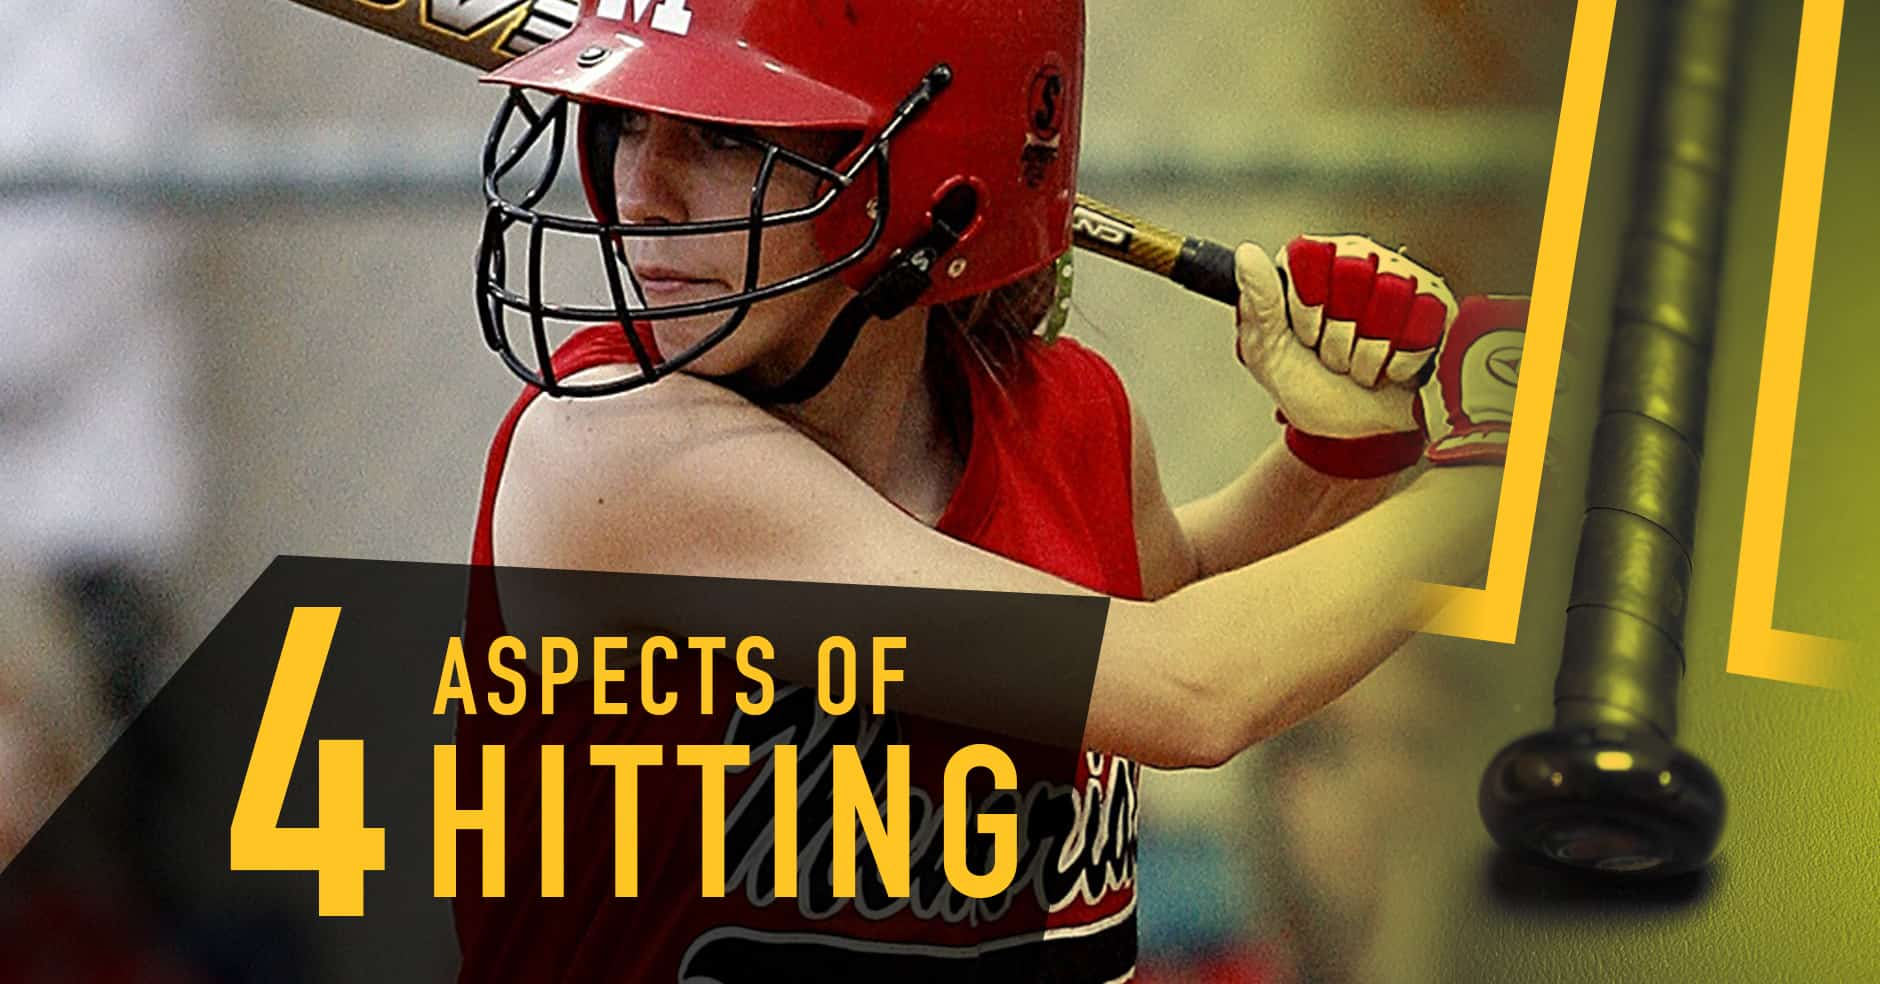 Hitting: 4 aspects of hitting